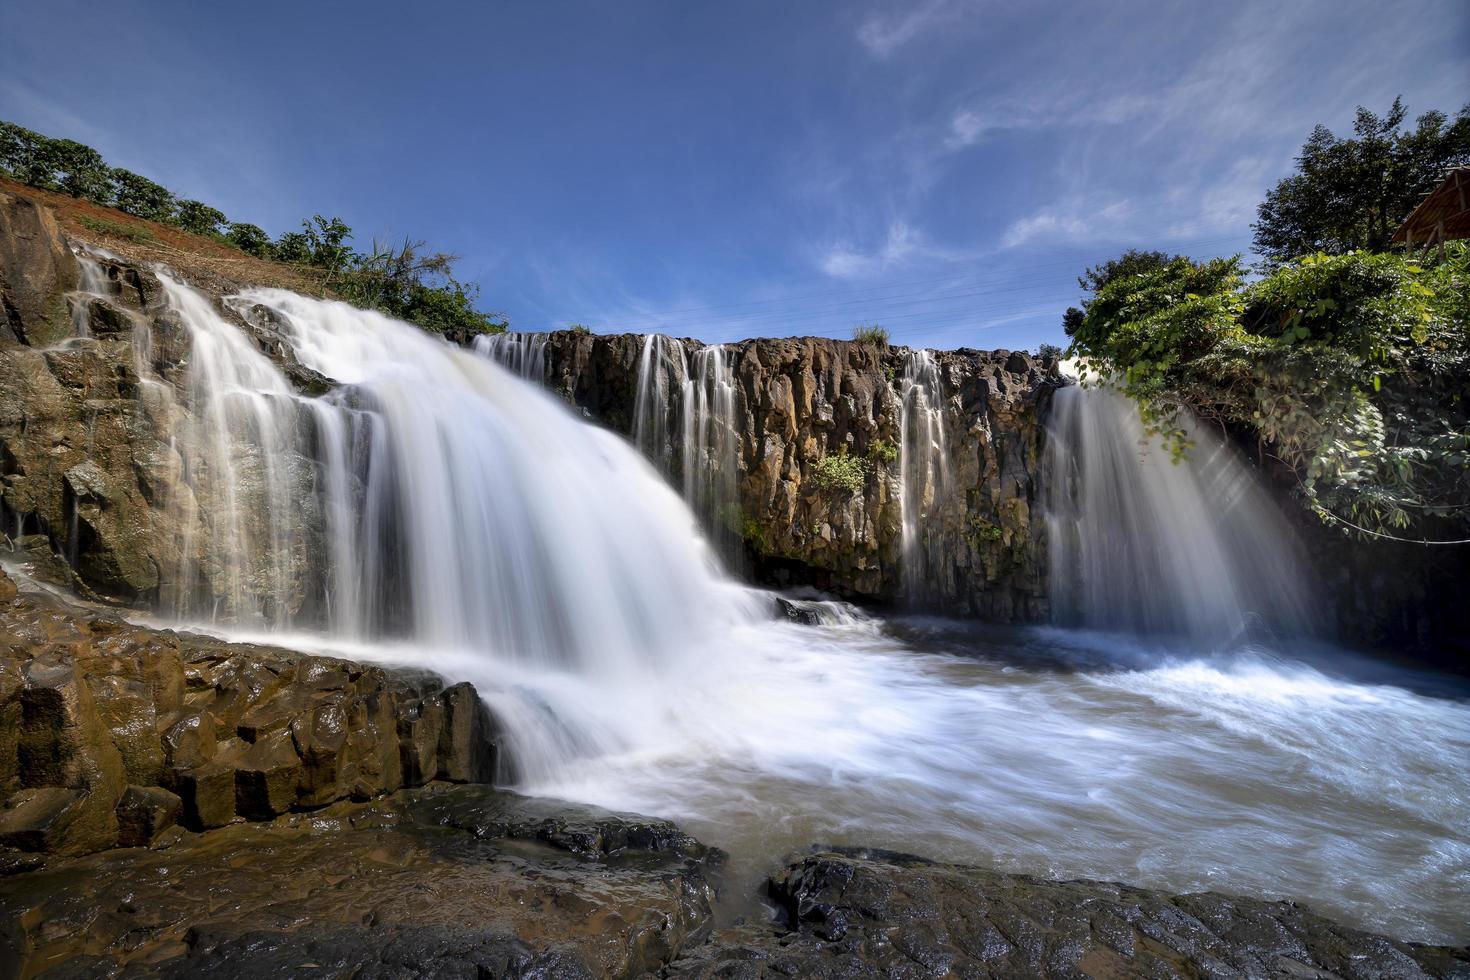 Waterfalls under blue sky photo